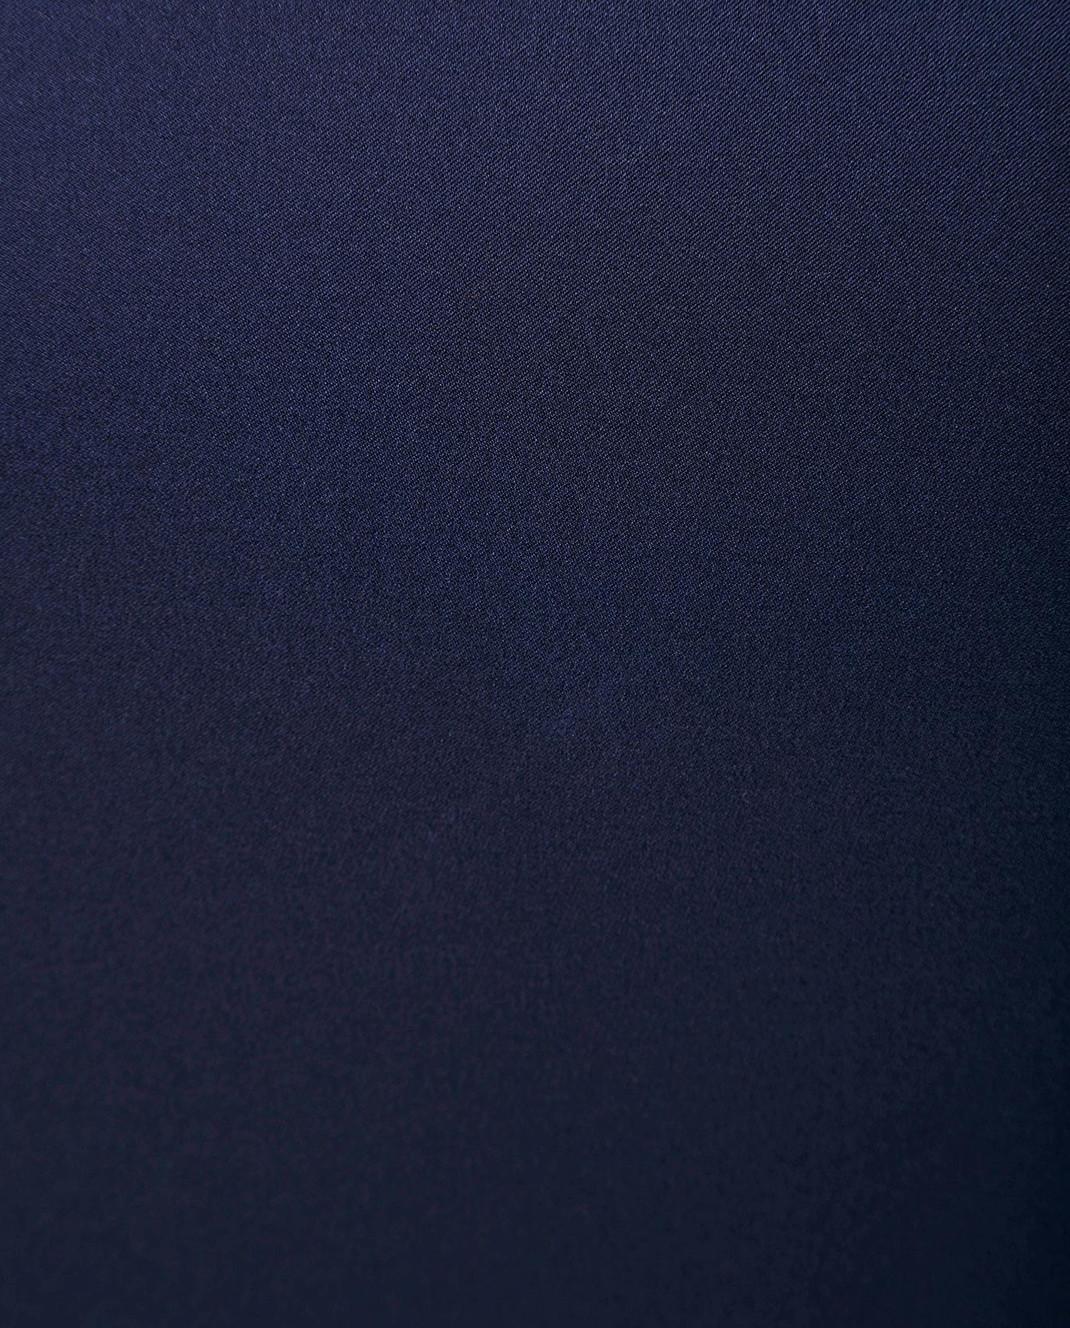 Allude Топ из шелка 18283000 изображение 5